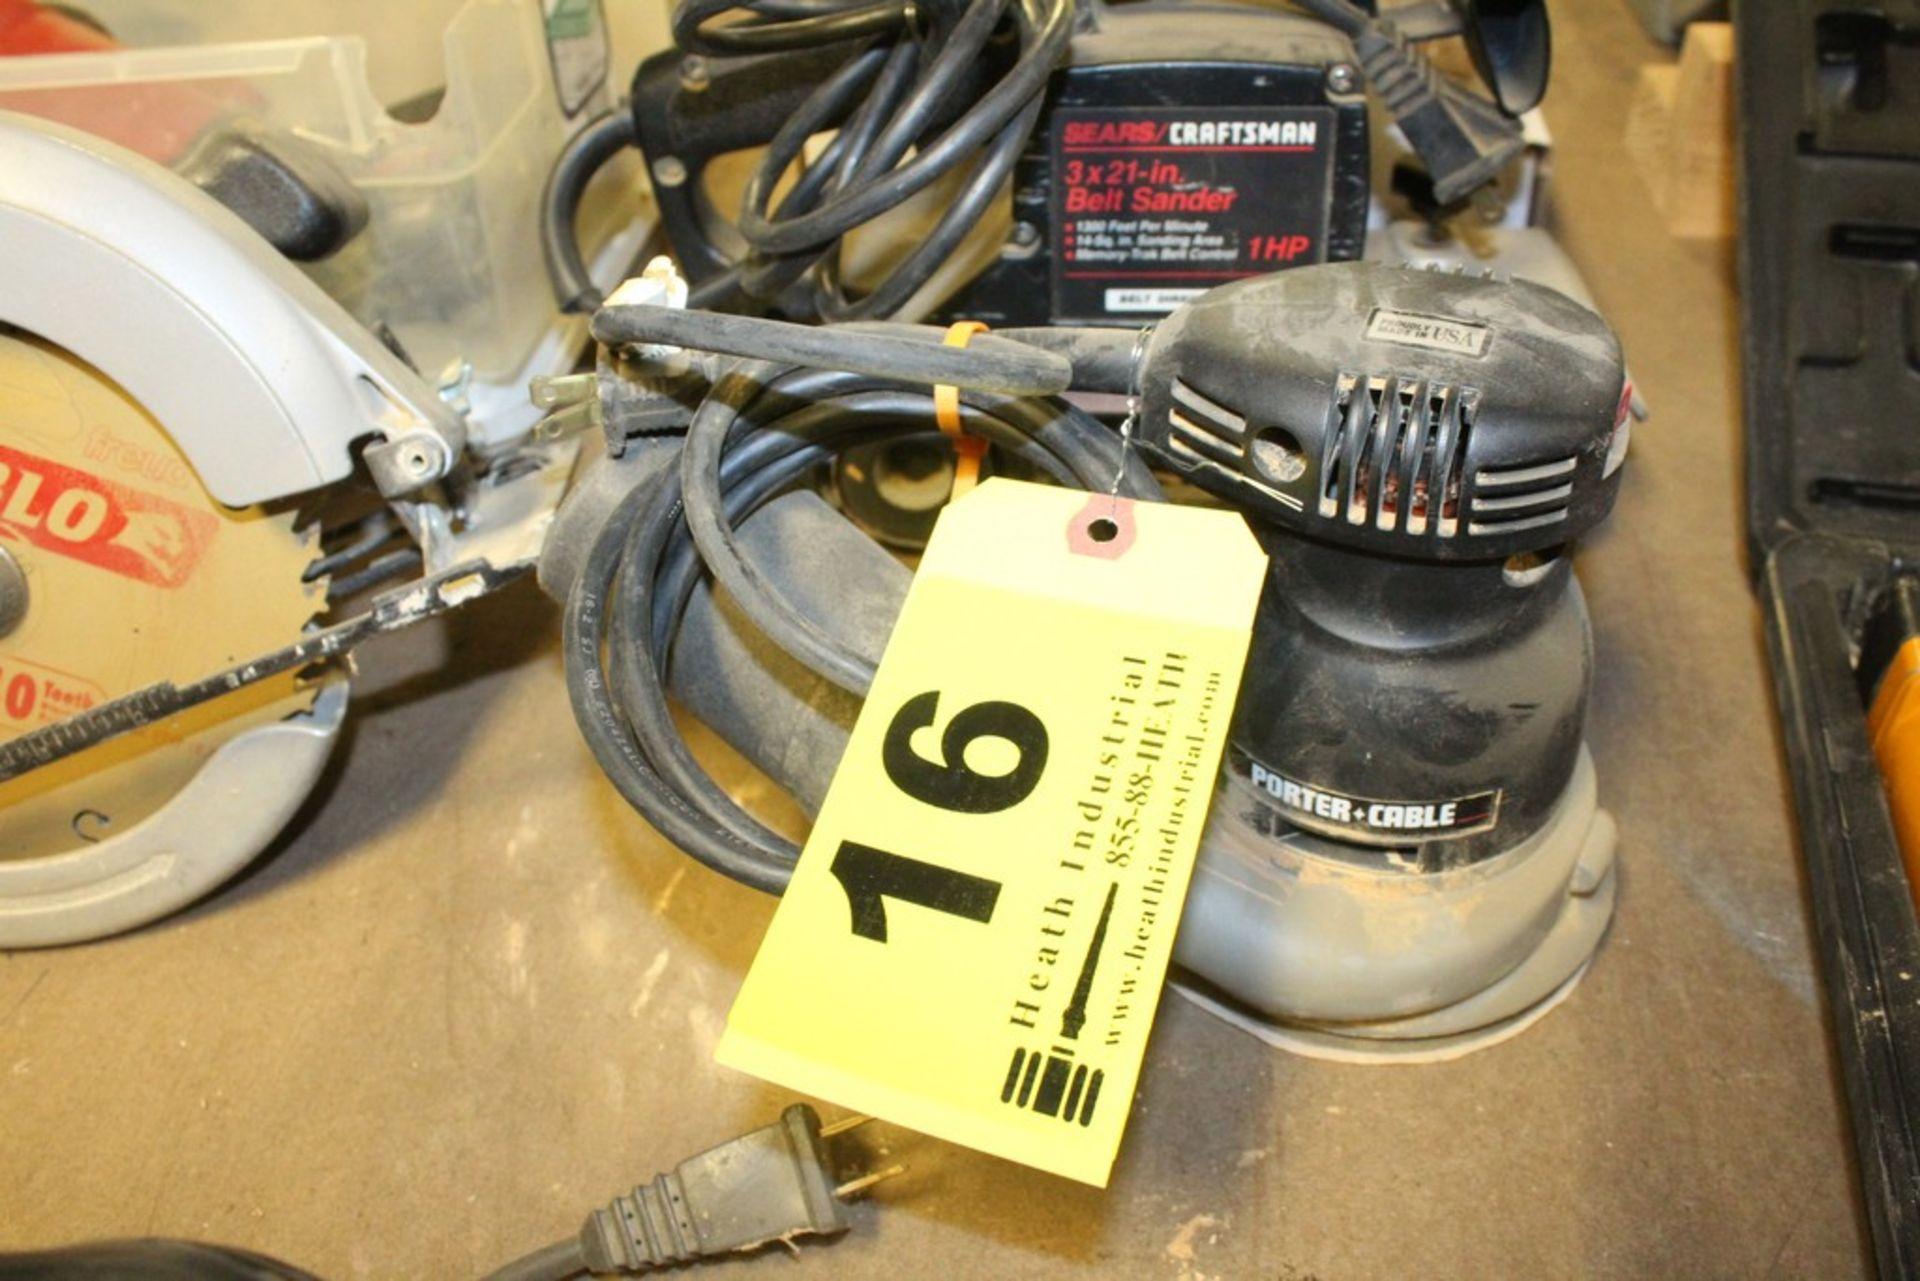 Lot 16 - PORTER-CABLE MODEL 333 RANDOM ORBITAL SANDER